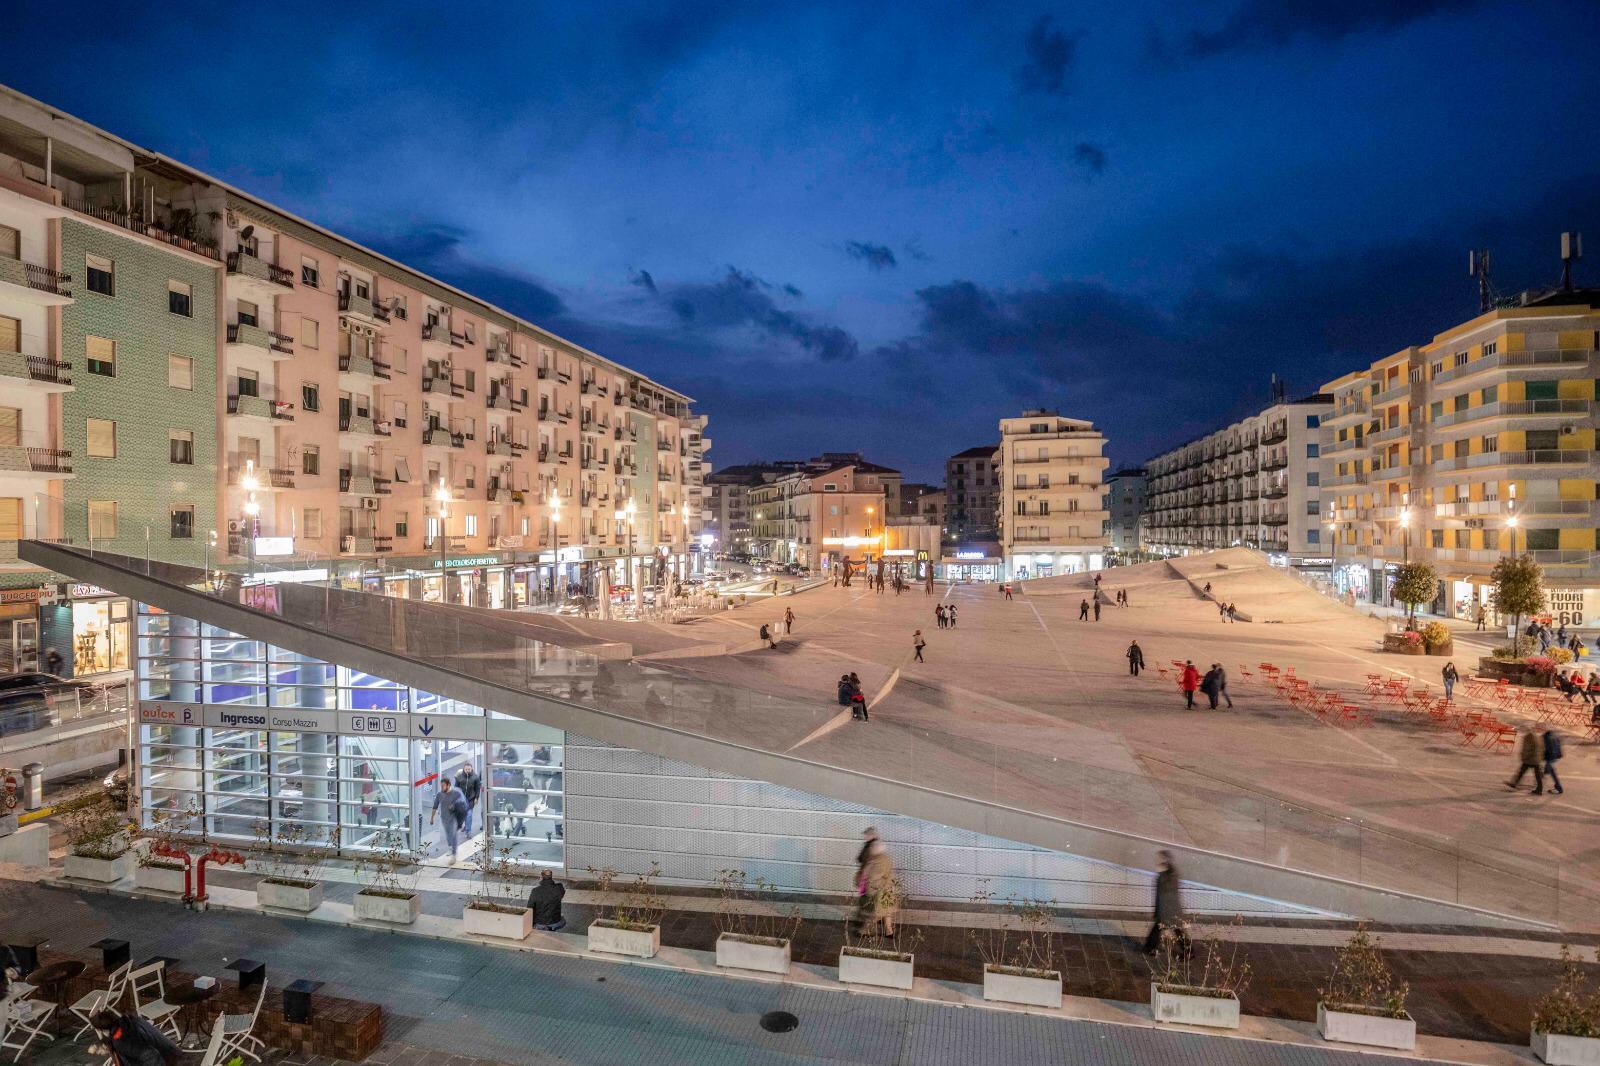 Piazza Bilotti